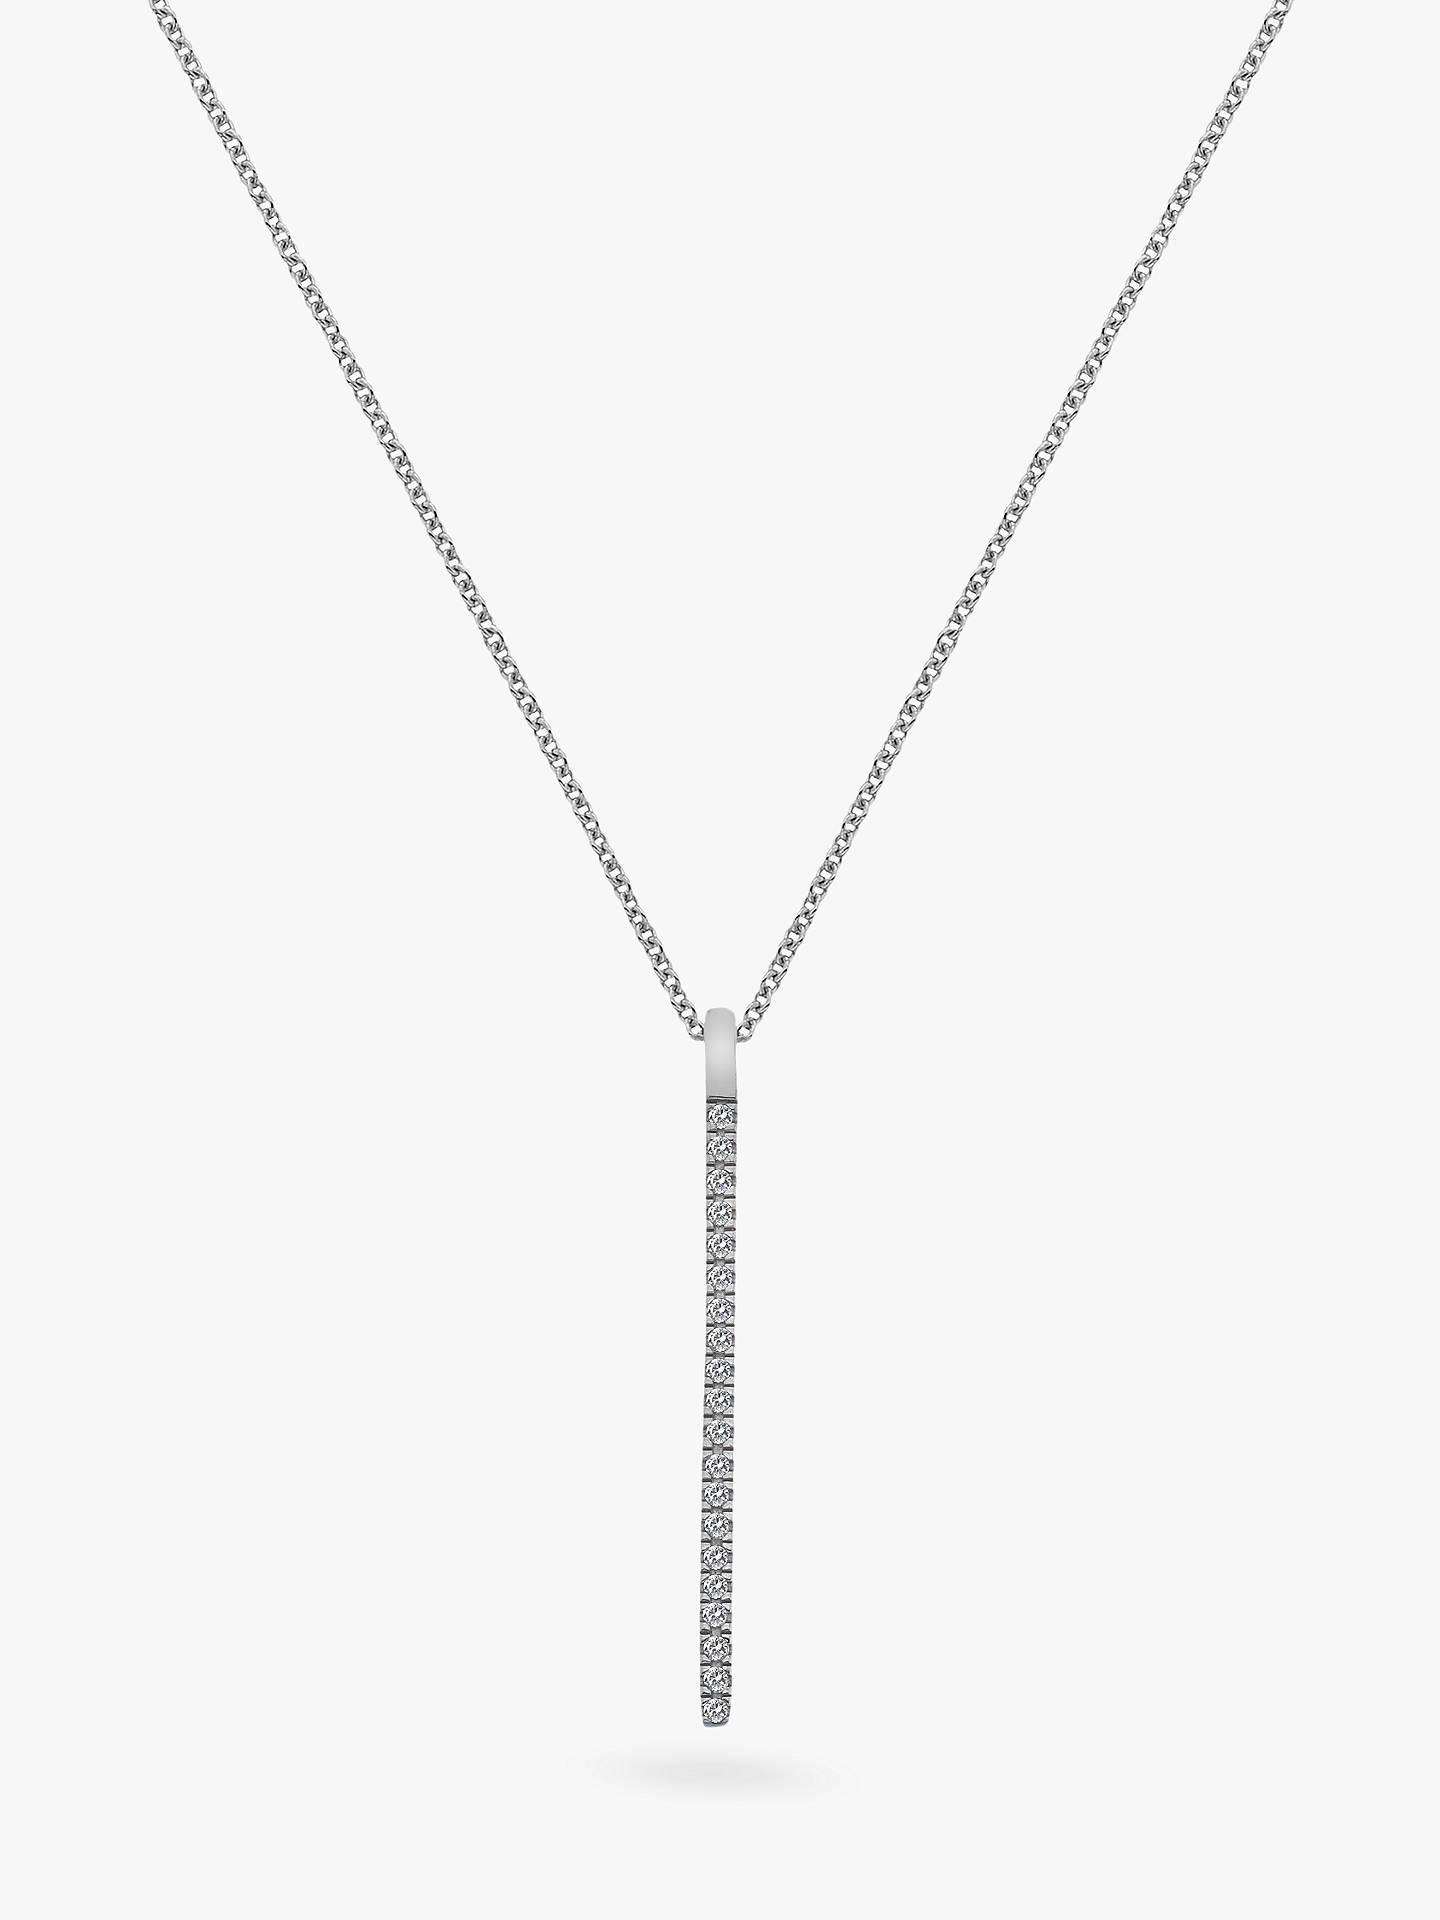 b9e5821d5ed4c Hot Diamonds 9ct White Gold Diamond Tranquillity Pendant Necklace